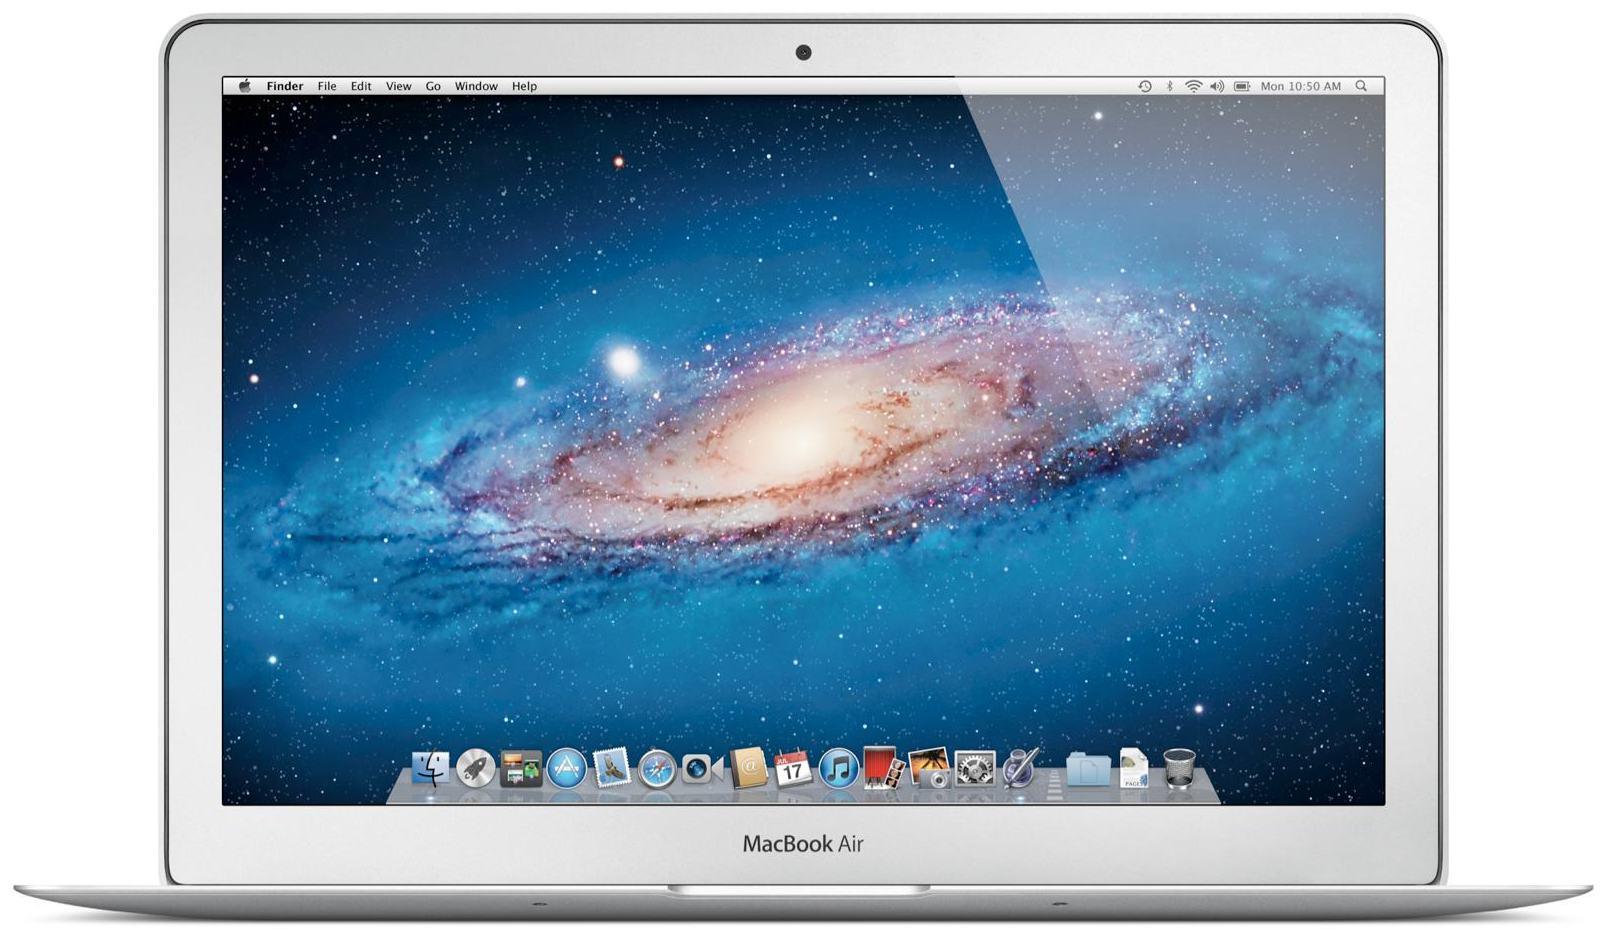 "Ноутбук Apple MacBook Air 13 13.3"" 1440x900, Intel Core i5 1.6GHz, 8Gb RAM, 256Gb SSD, WiFi, BT, Cam, Mac OS, серебристый (MGG2RU/A)"